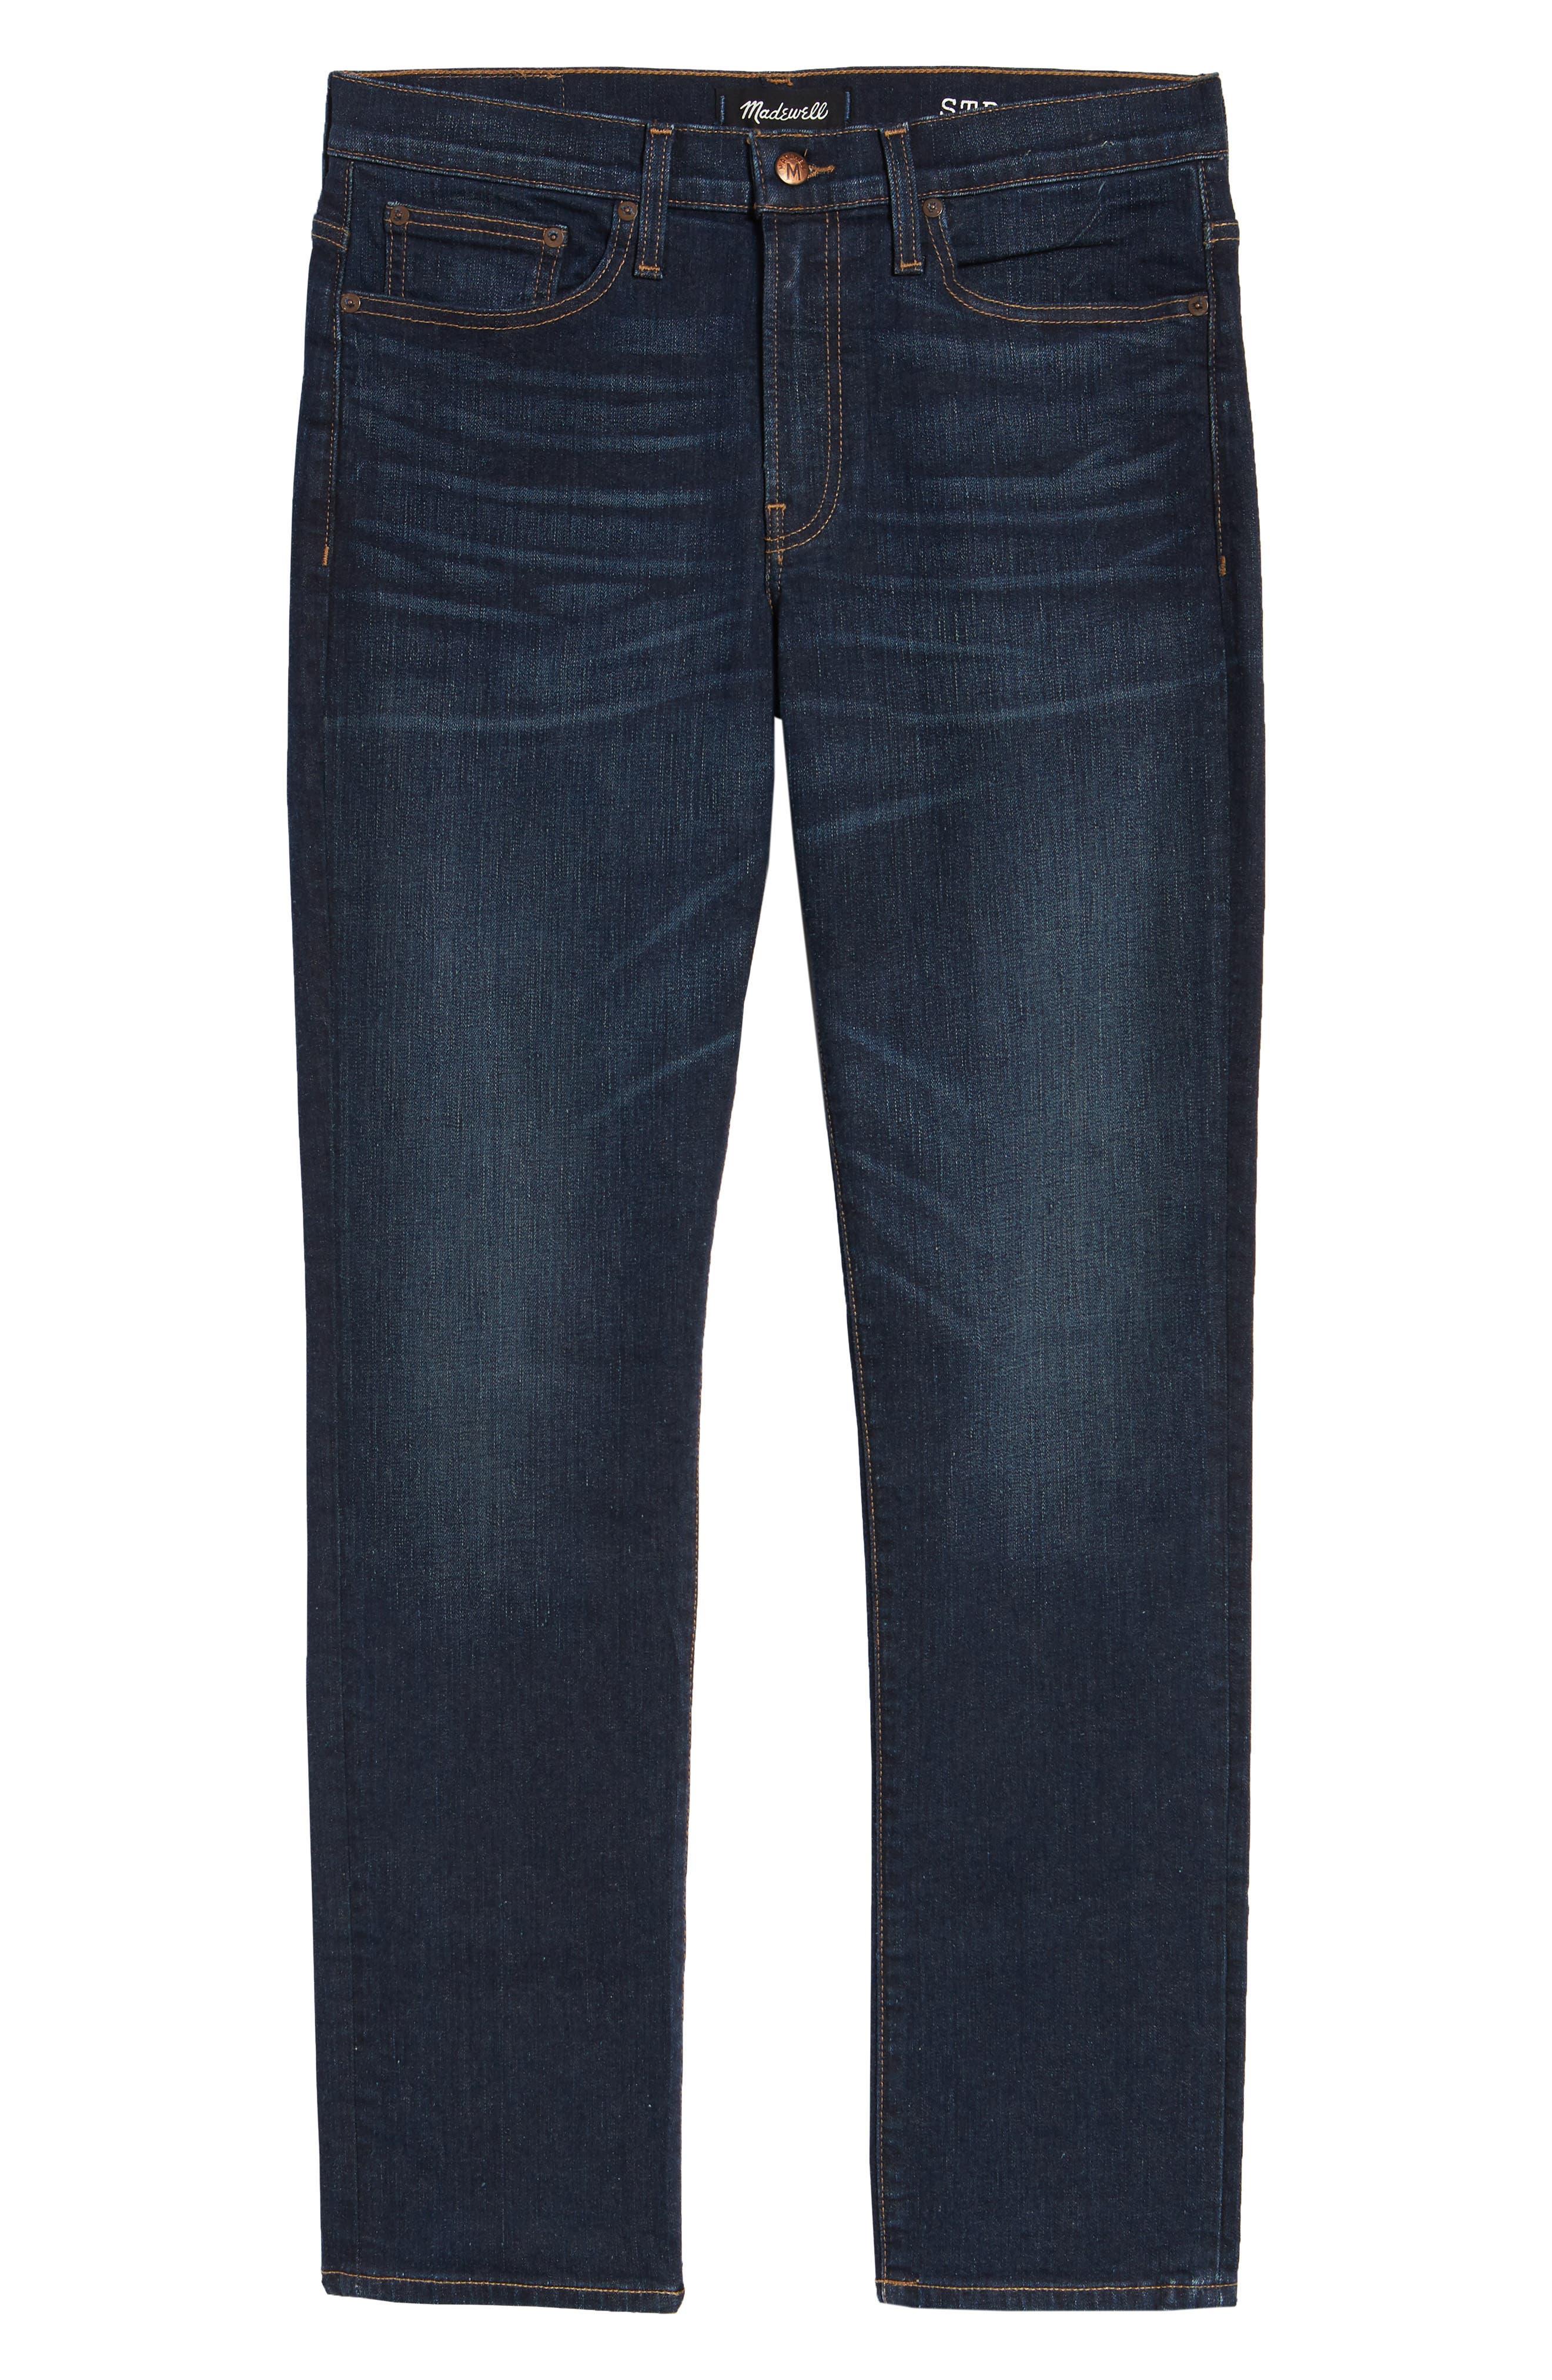 Slim Straight Fit Jeans,                             Alternate thumbnail 4, color,                             BRENFORD